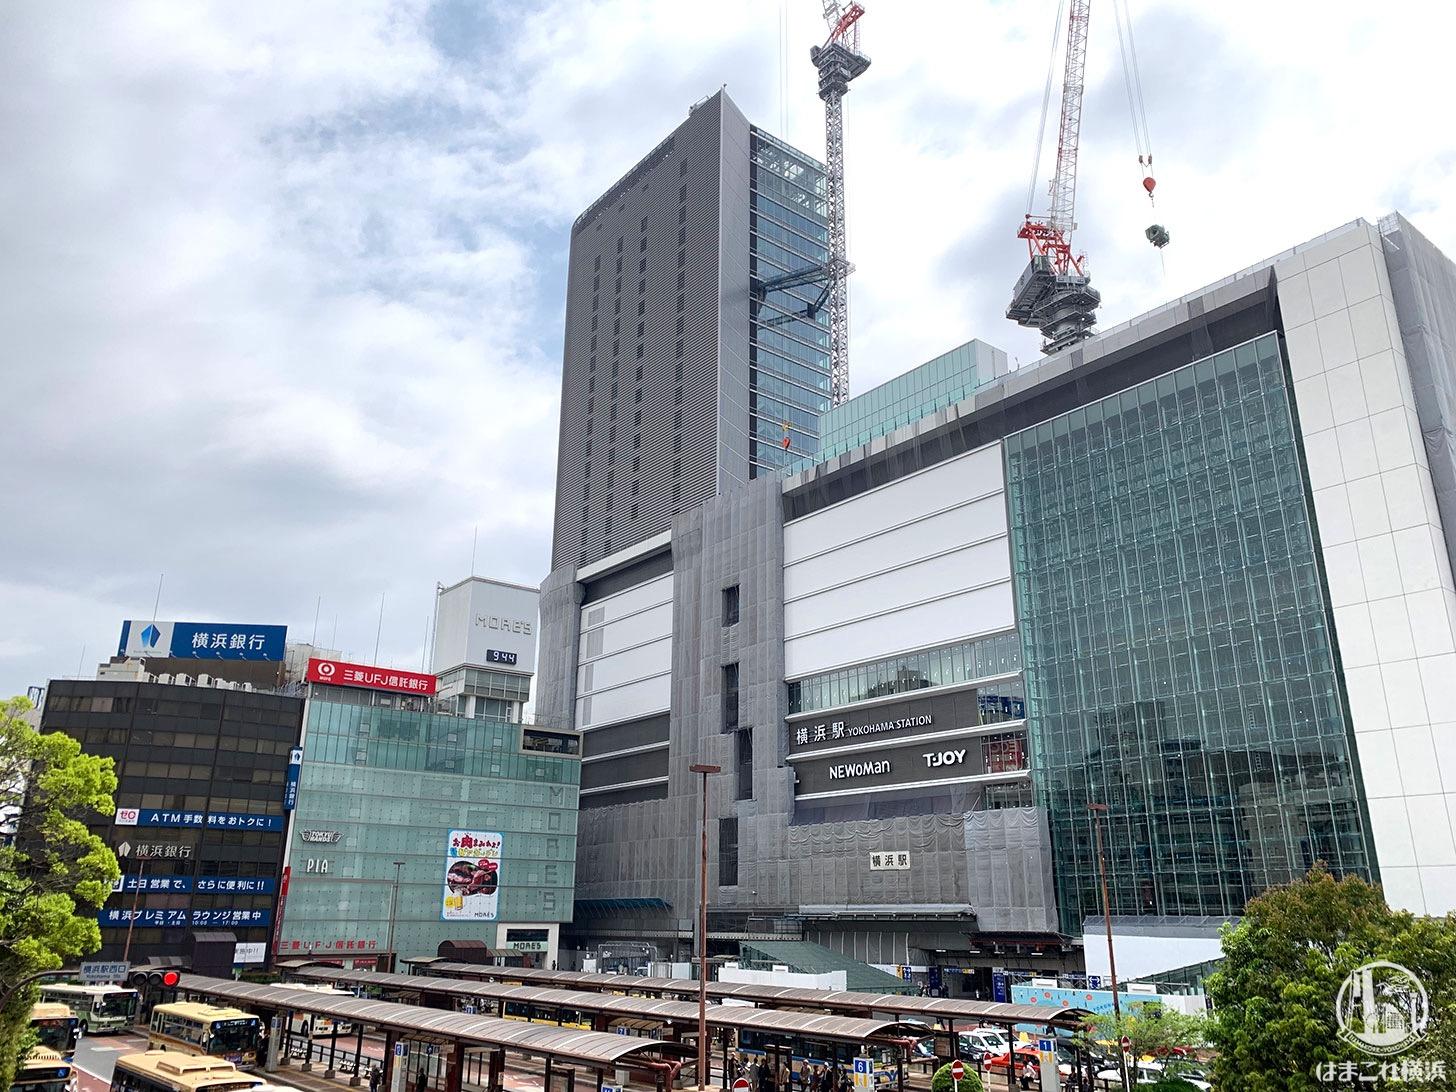 2019年5月 横浜駅西口の様子